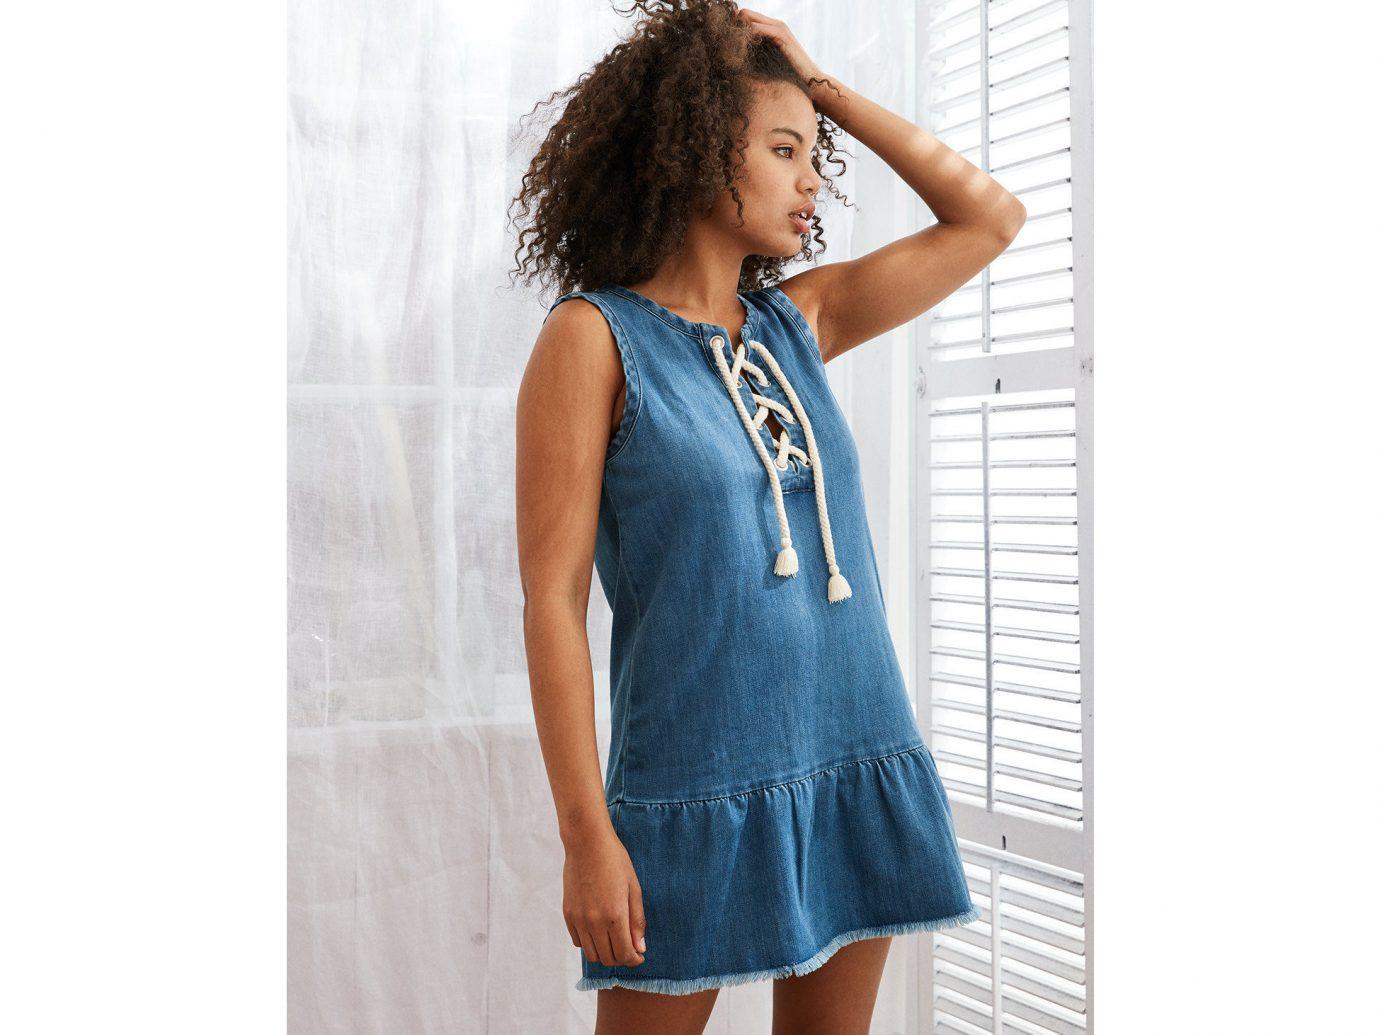 Style + Design Travel Shop clothing person shoulder fashion model day dress denim one piece garment dress neck electric blue jeans sleeve waist